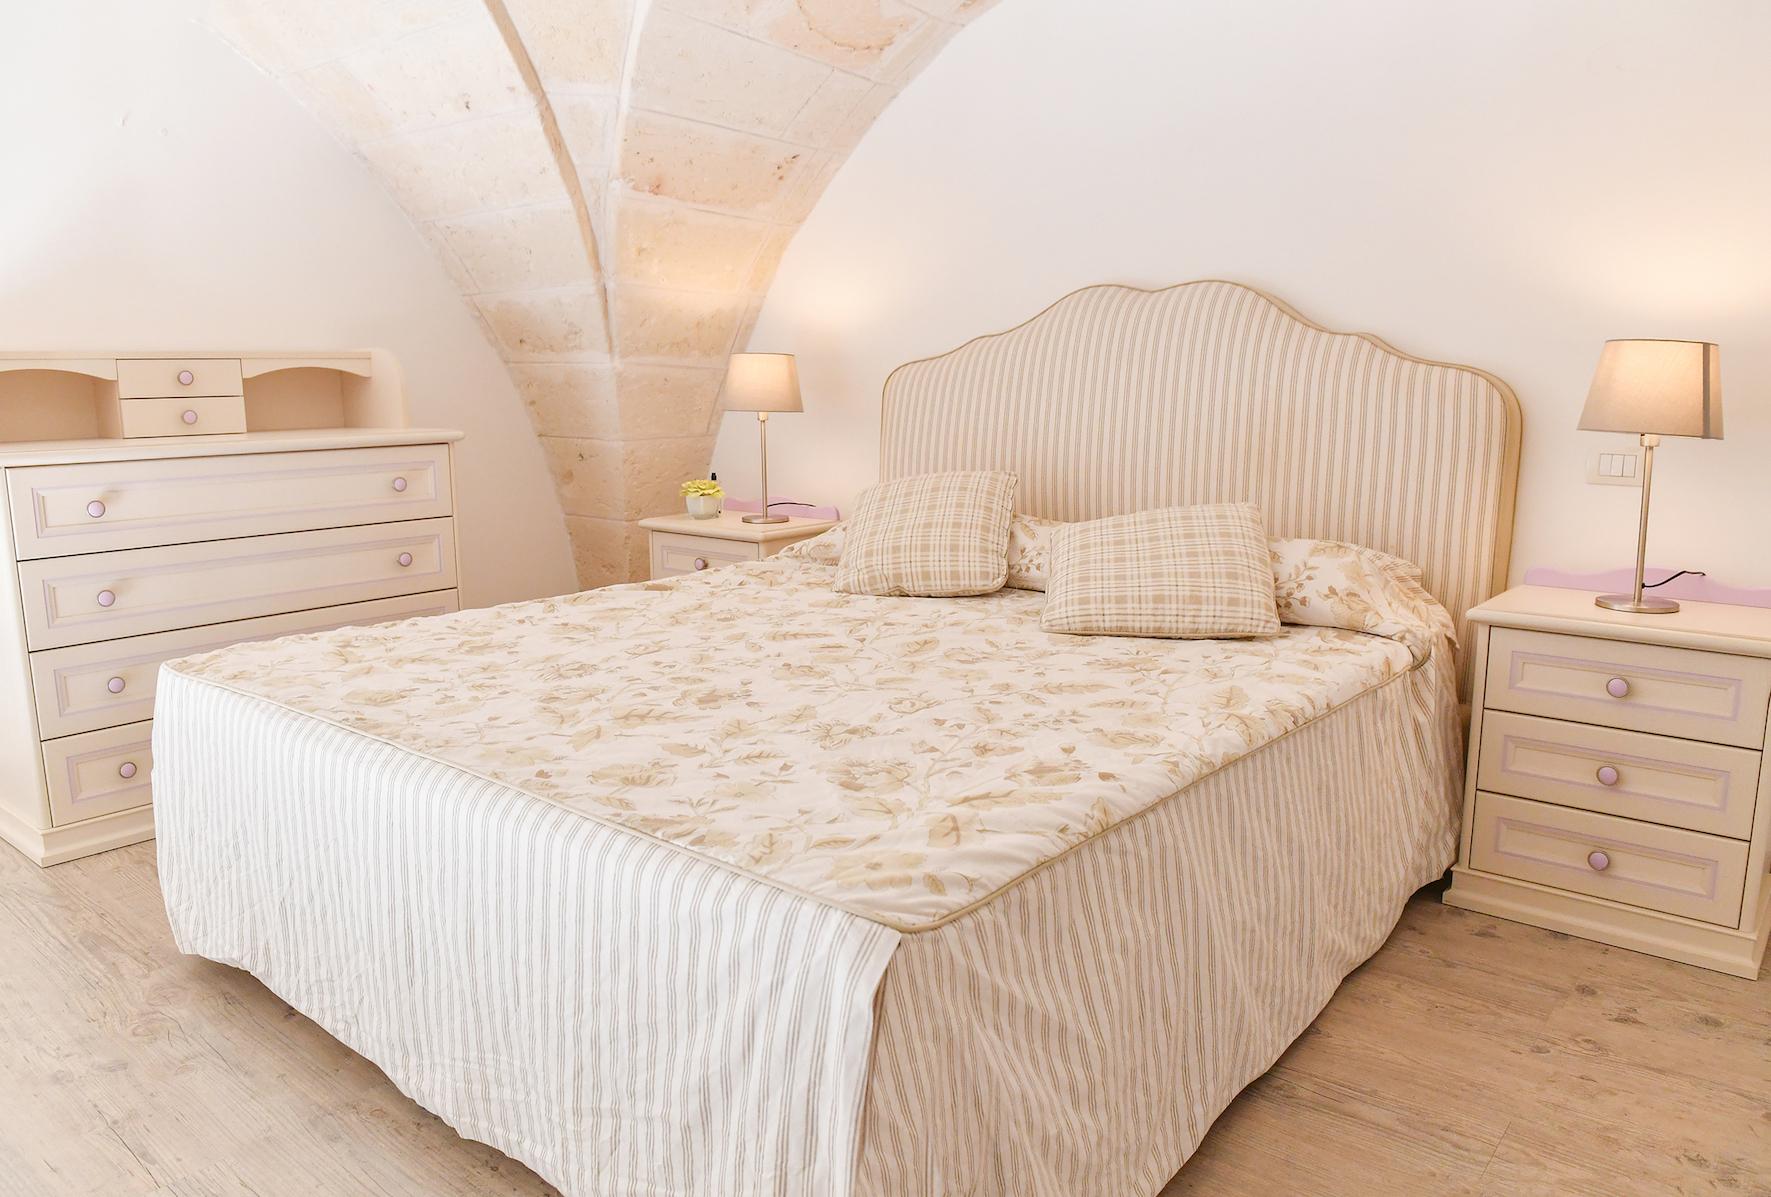 Lecce 5 - Zimmer mit  Mezzanin